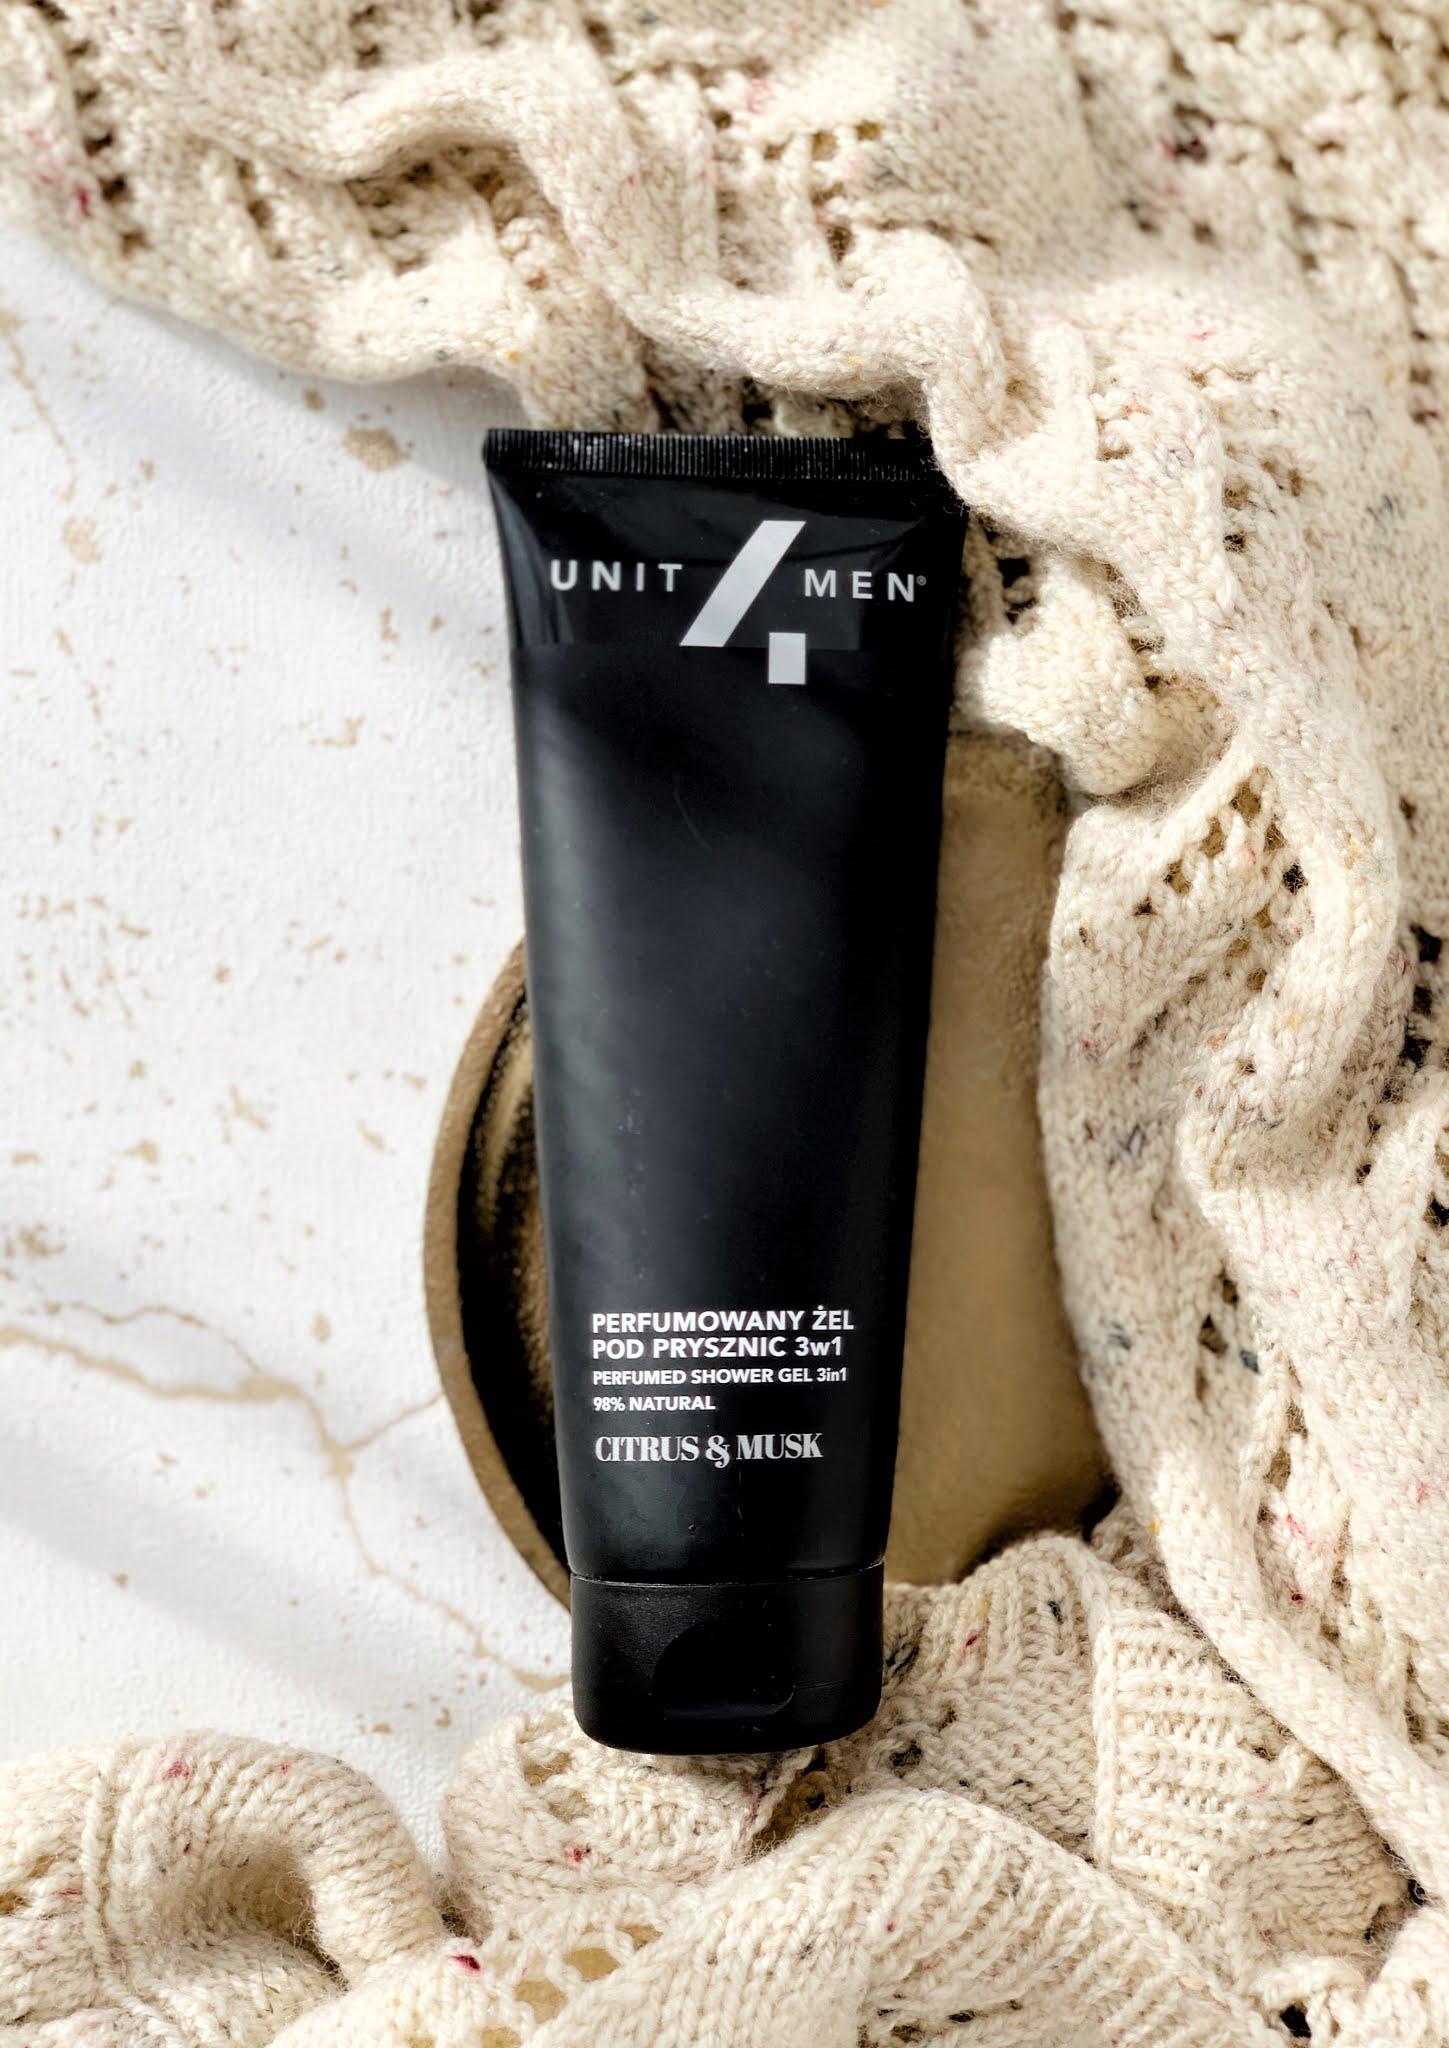 Zel-pod-prysznic-3w1-Unit4Men